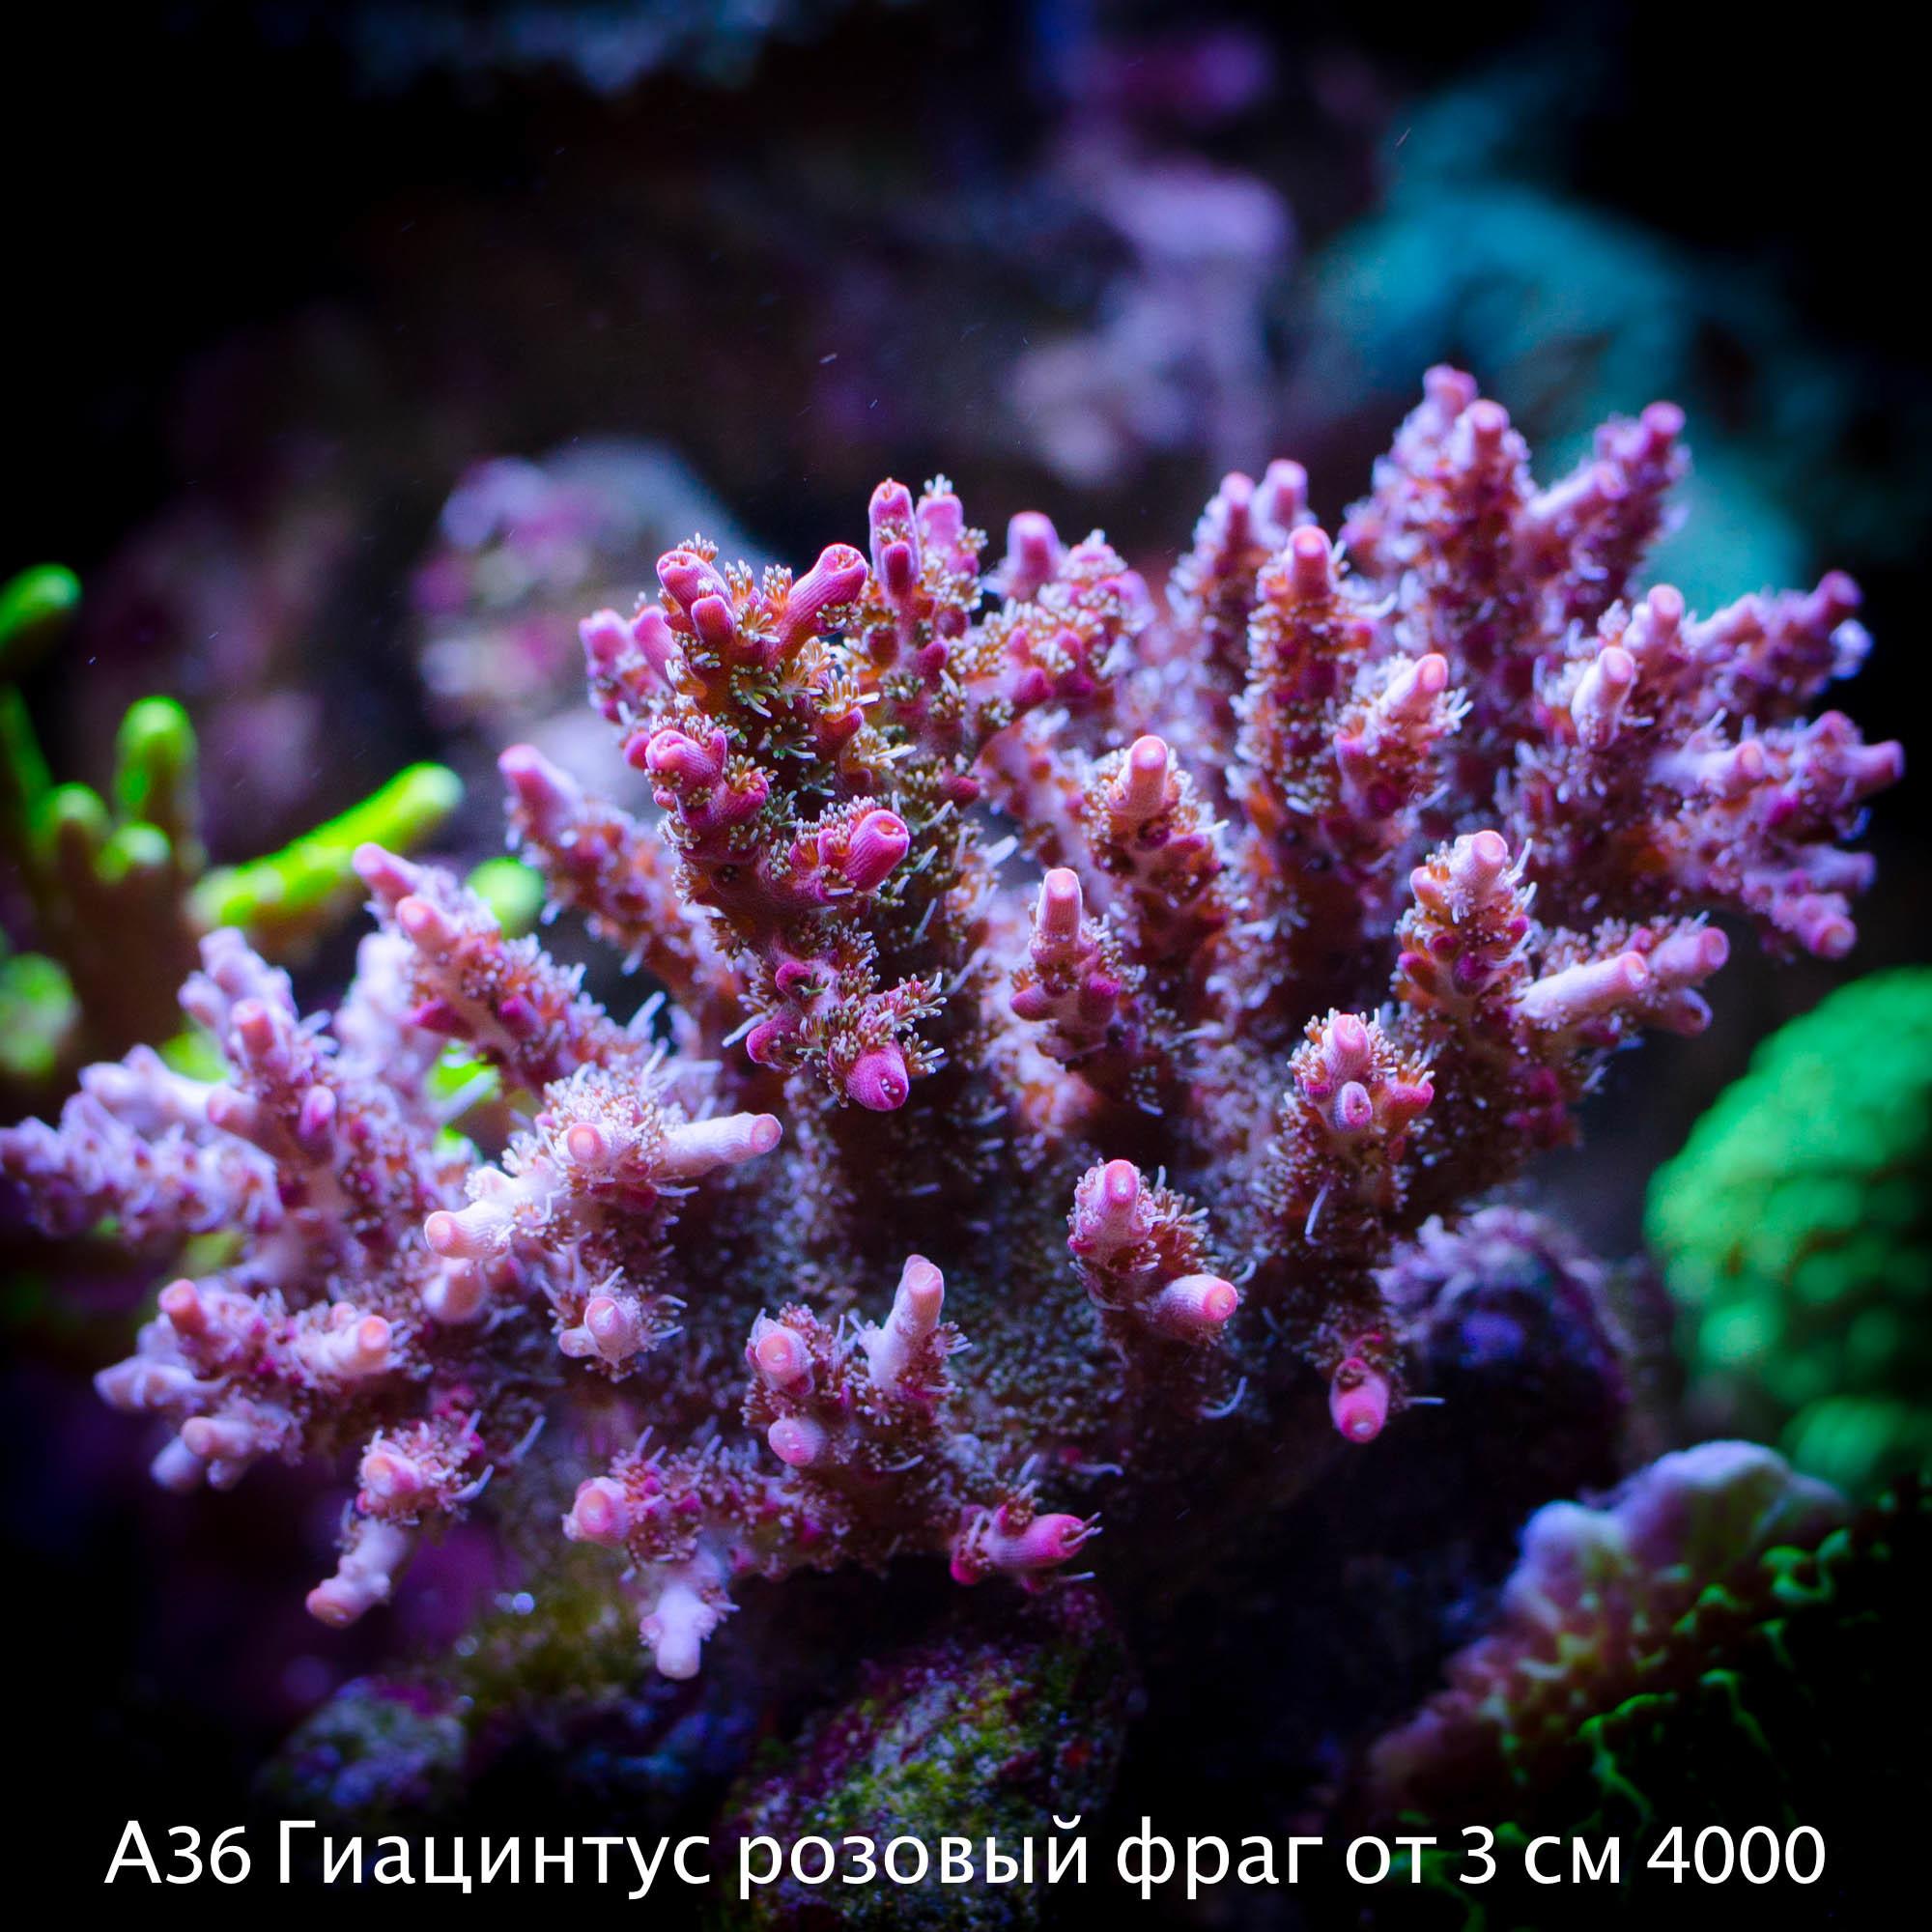 А36 Гиацинтус розовый фраг от 3 см 4000